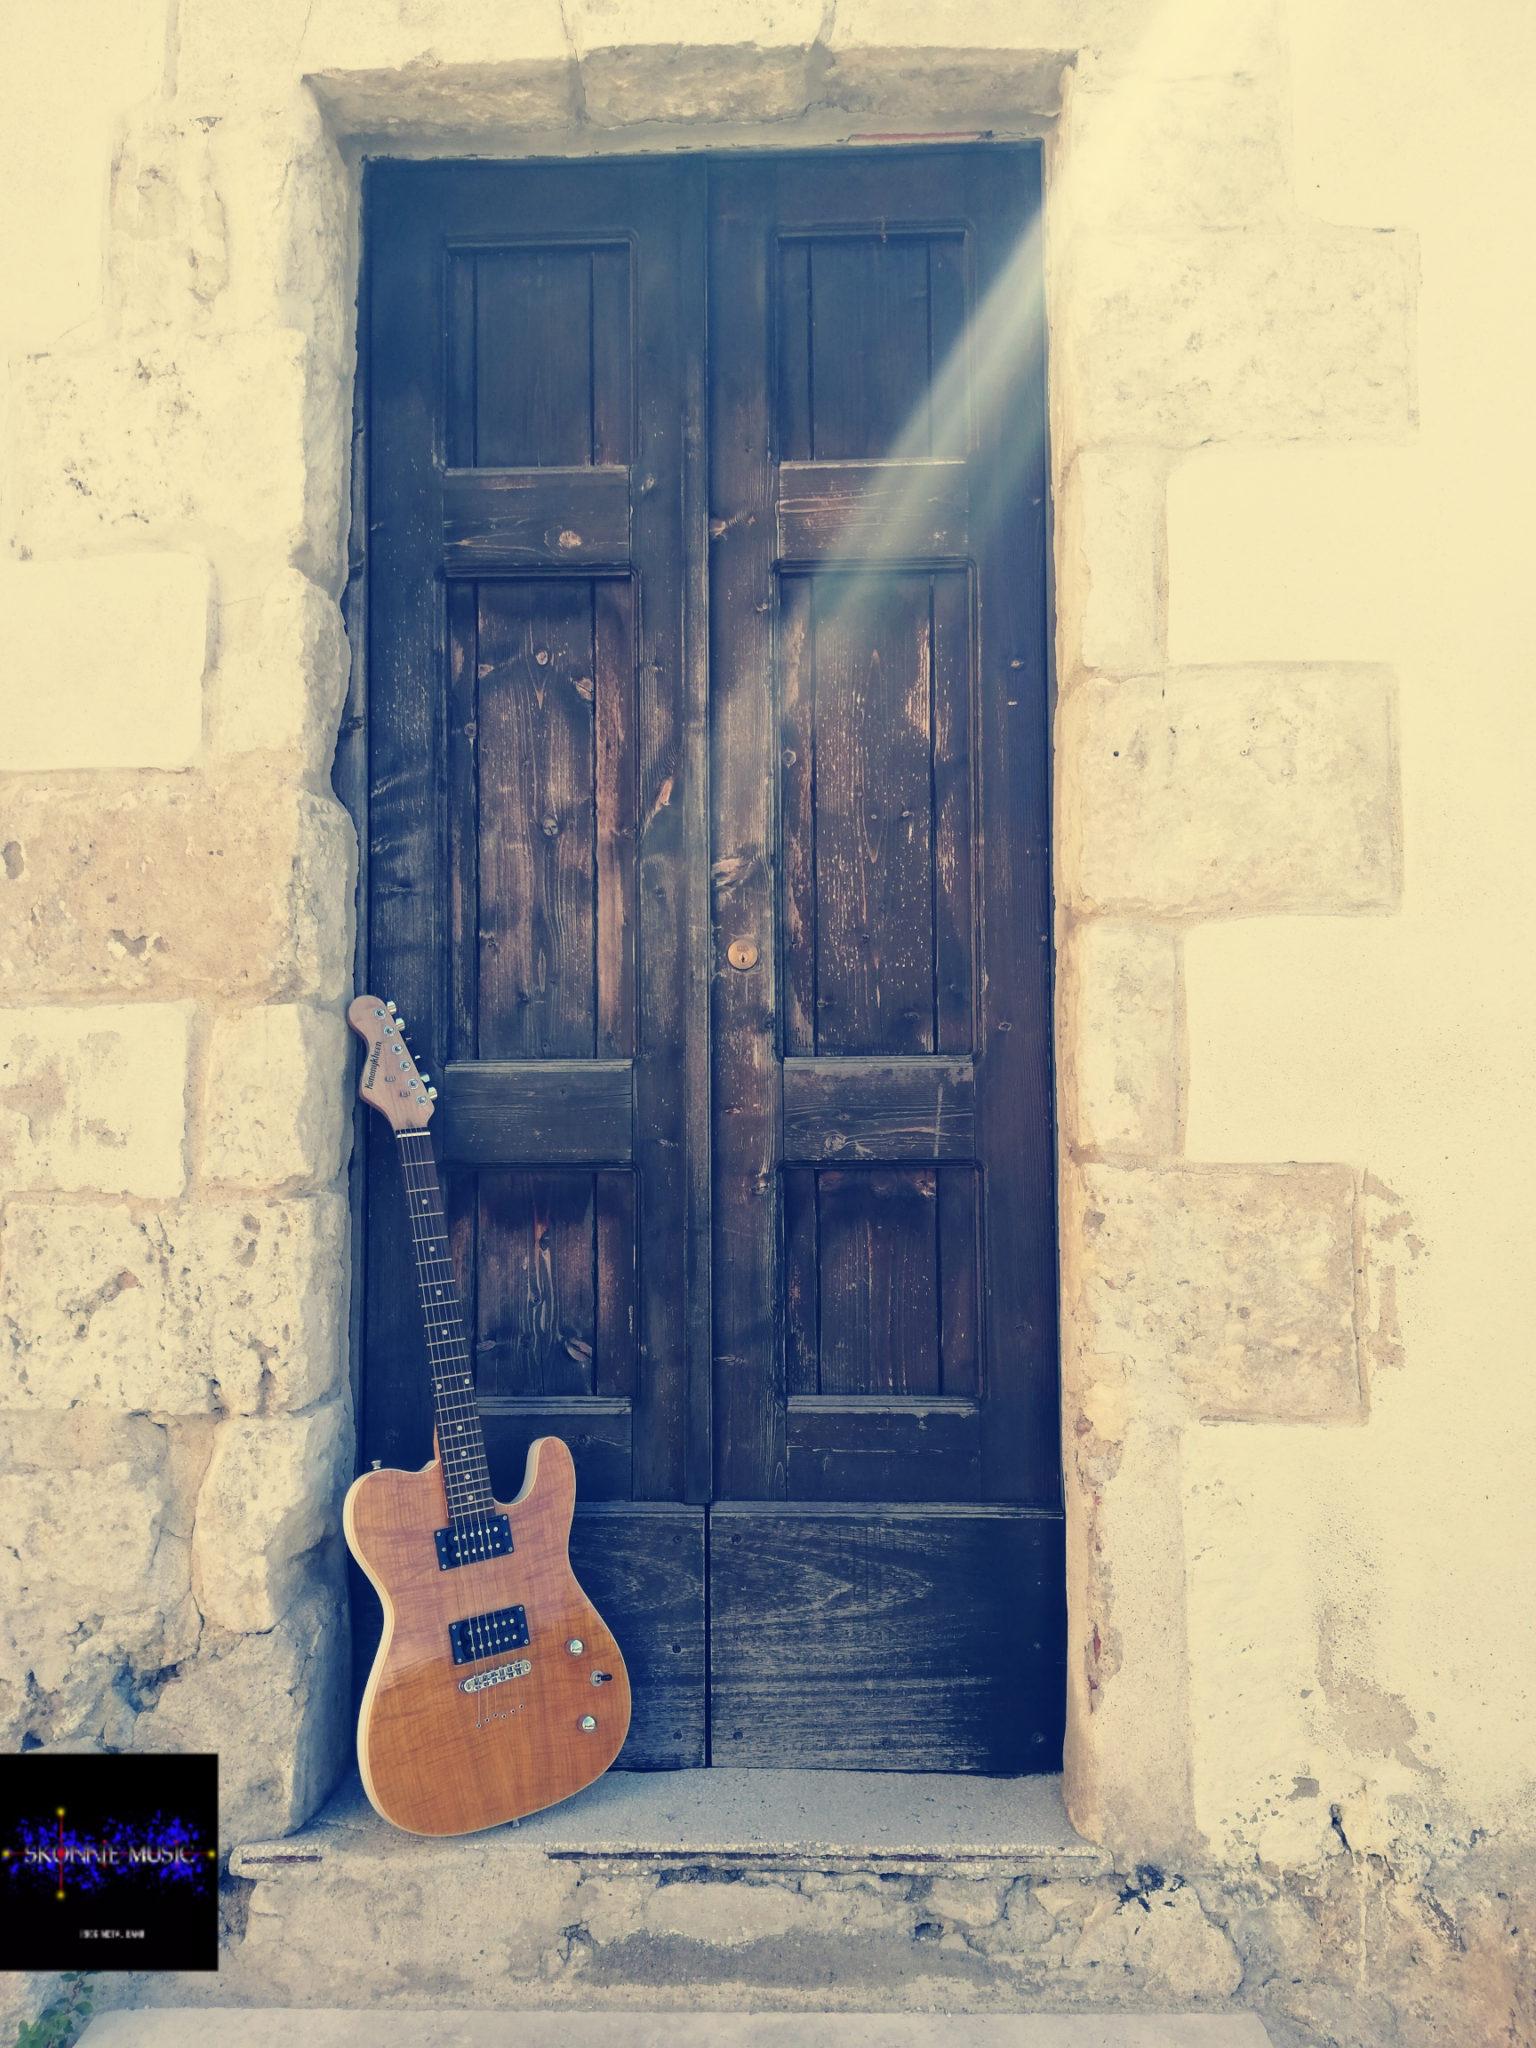 Guitar, Skonnie Music, Connie Yerbic, Vintage, Kononykheen Guitars, metal band